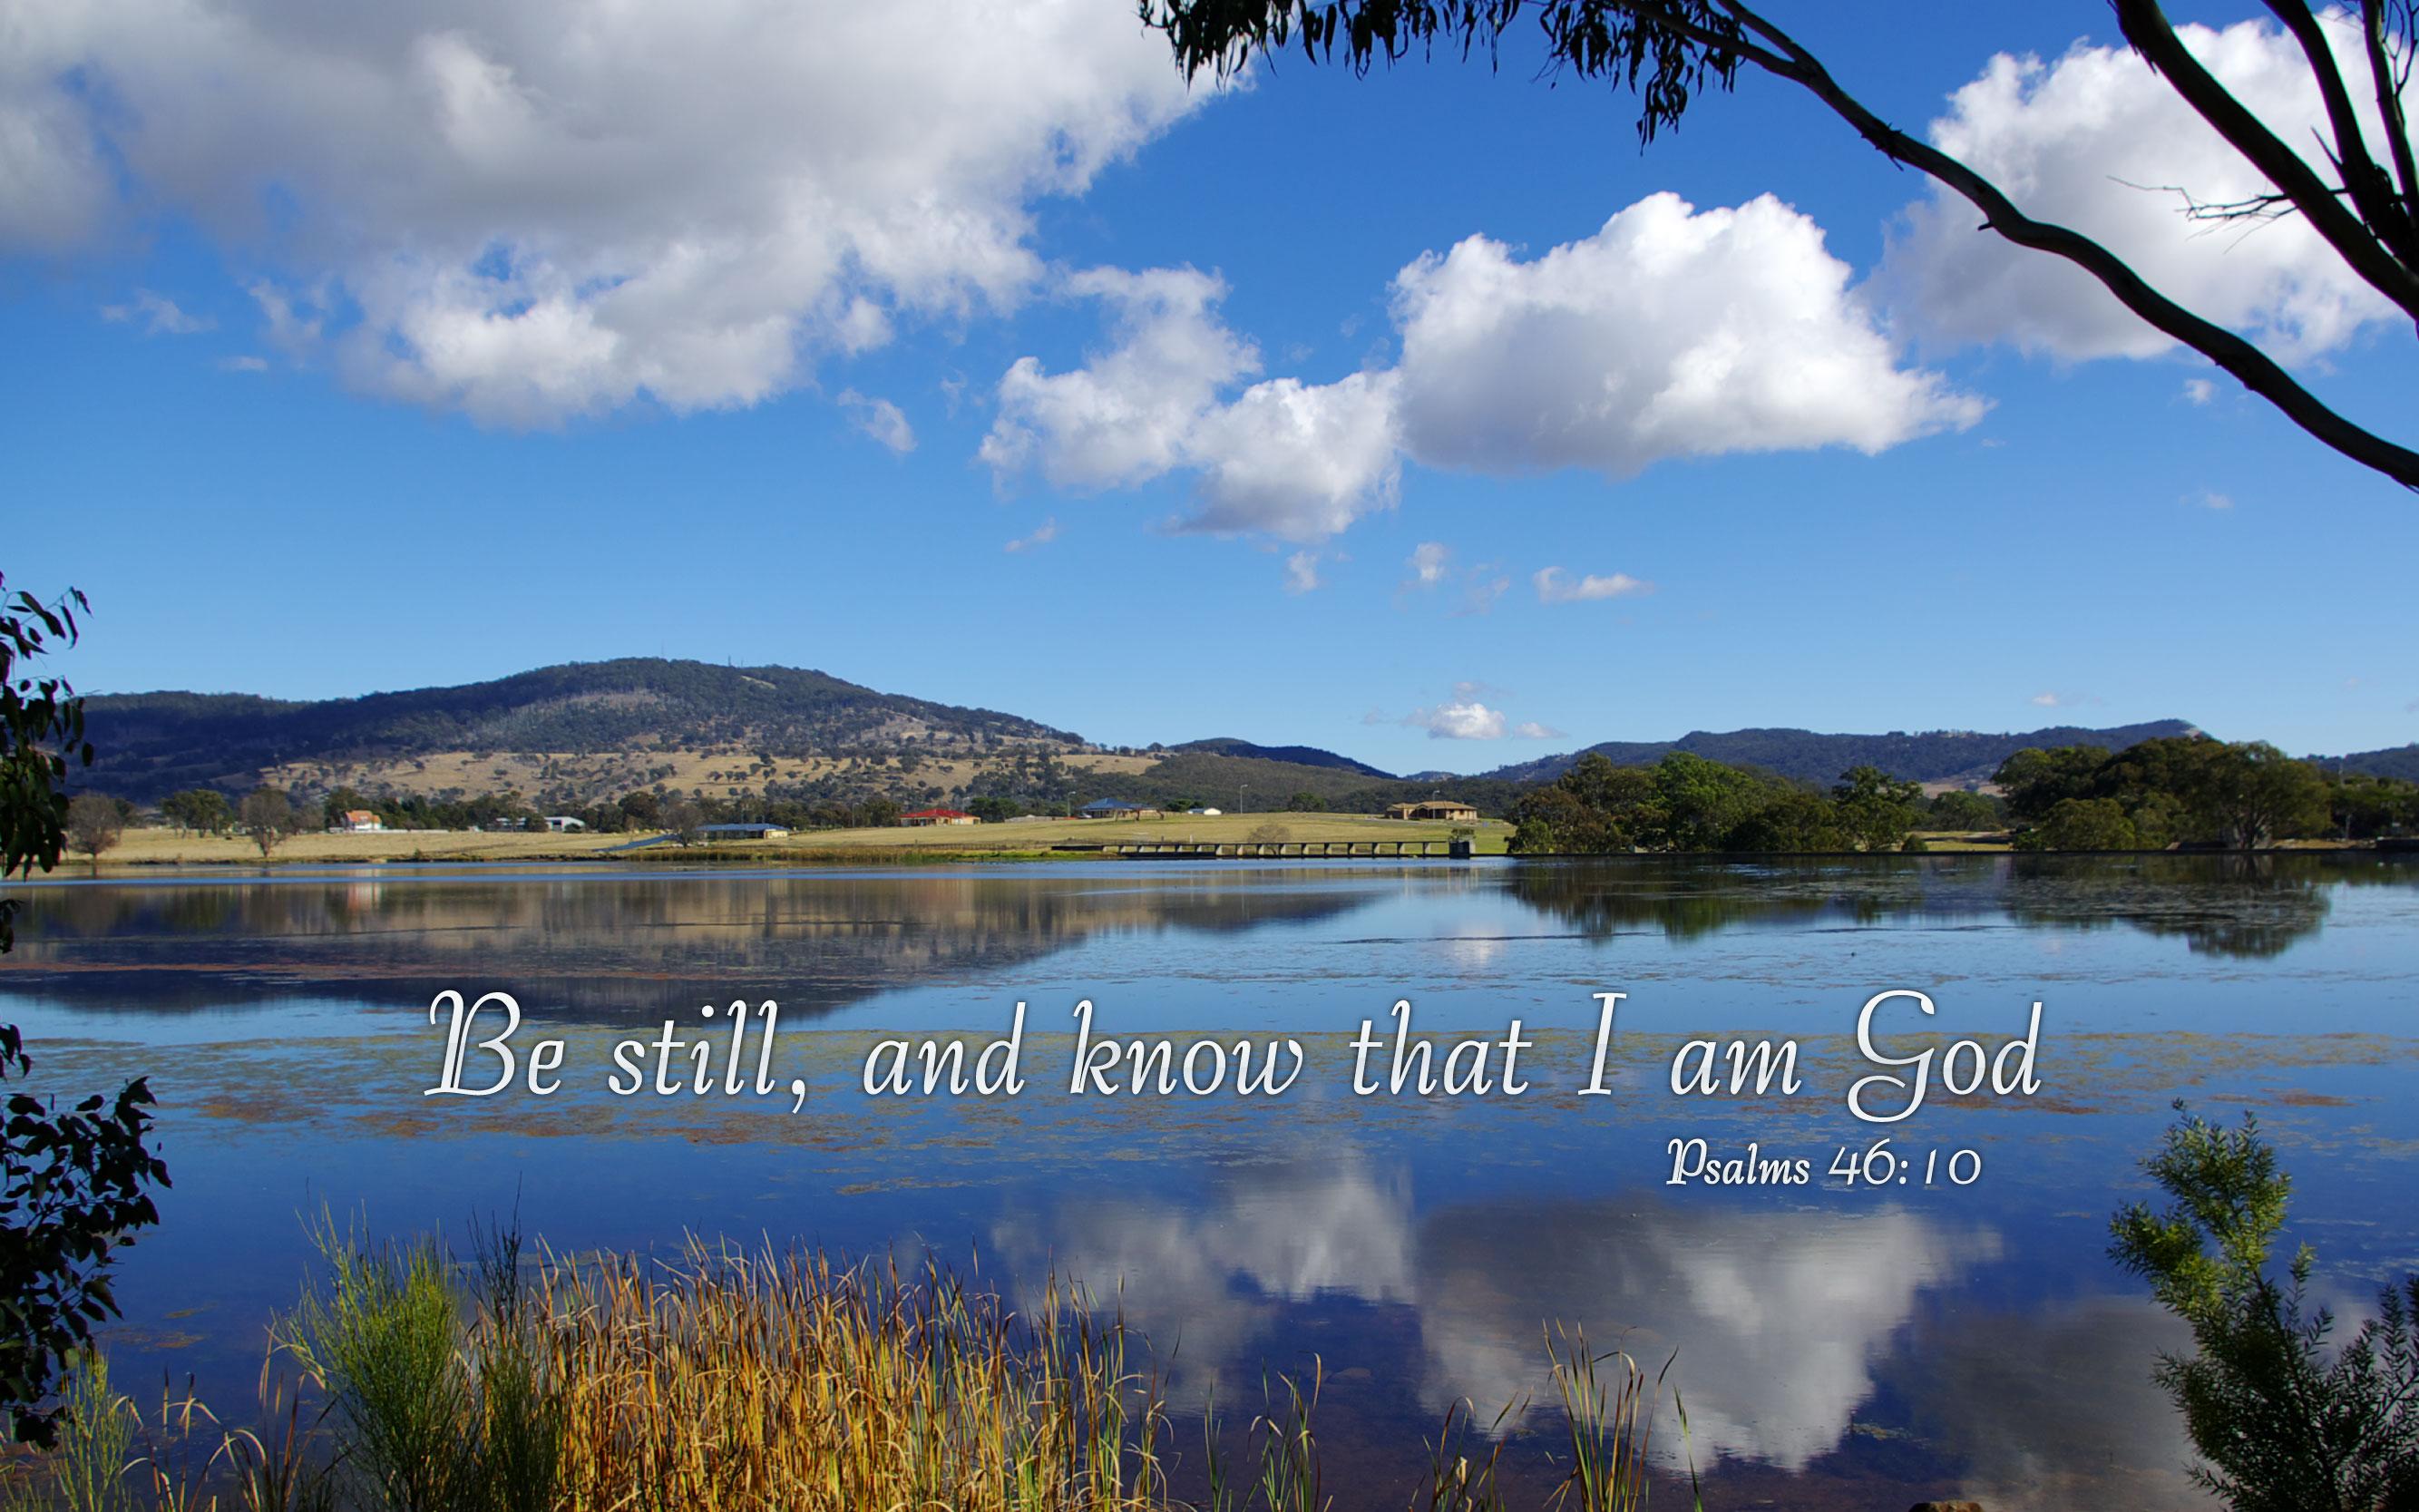 psalms 46:10 - free nature & bible desktop background / wallpaper